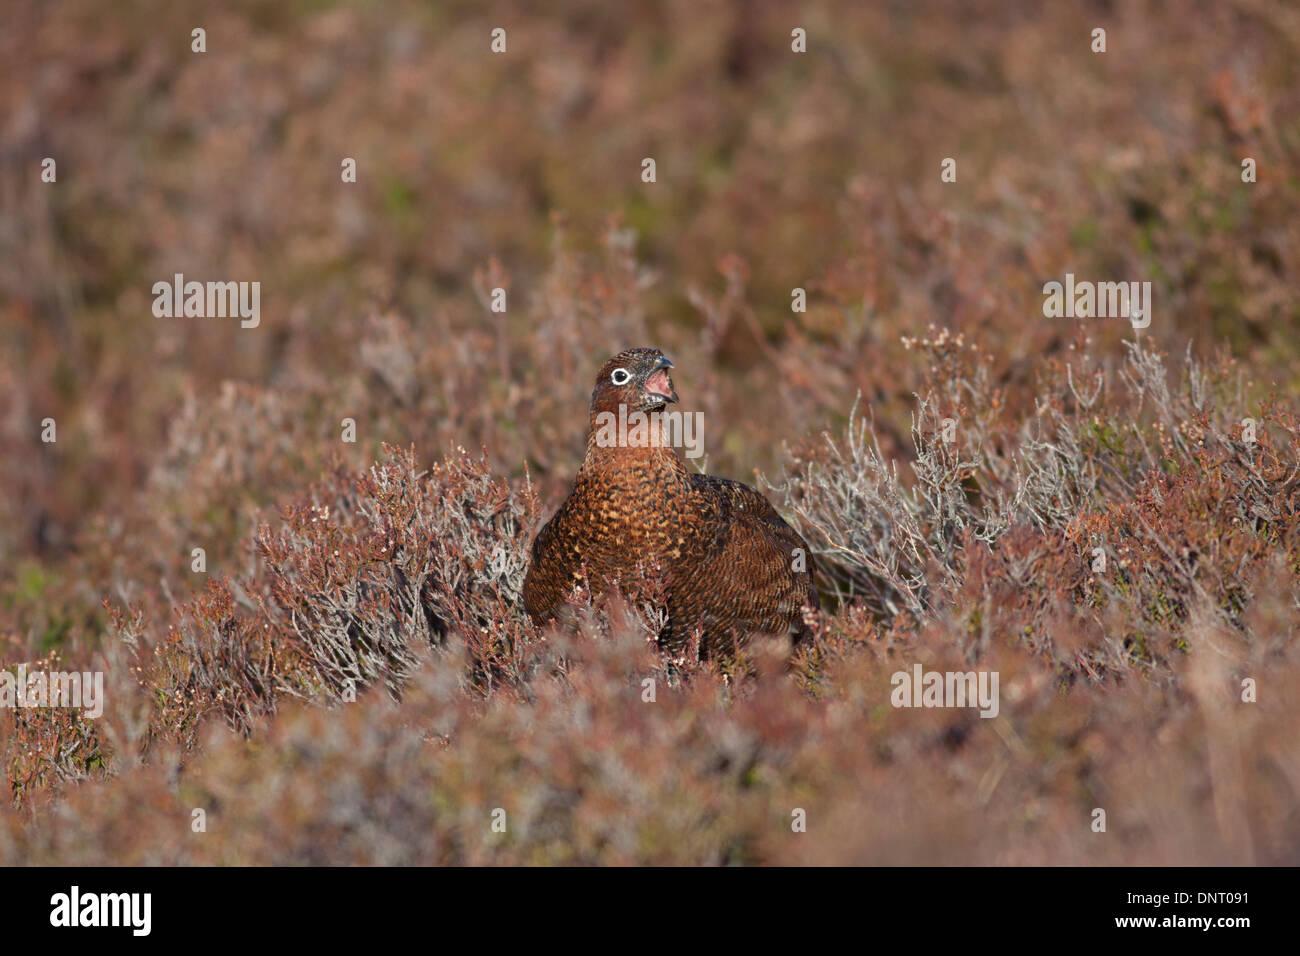 Female Red grouse (Lagopus lagopus scotica), Highlands, Scotland, UK - Stock Image